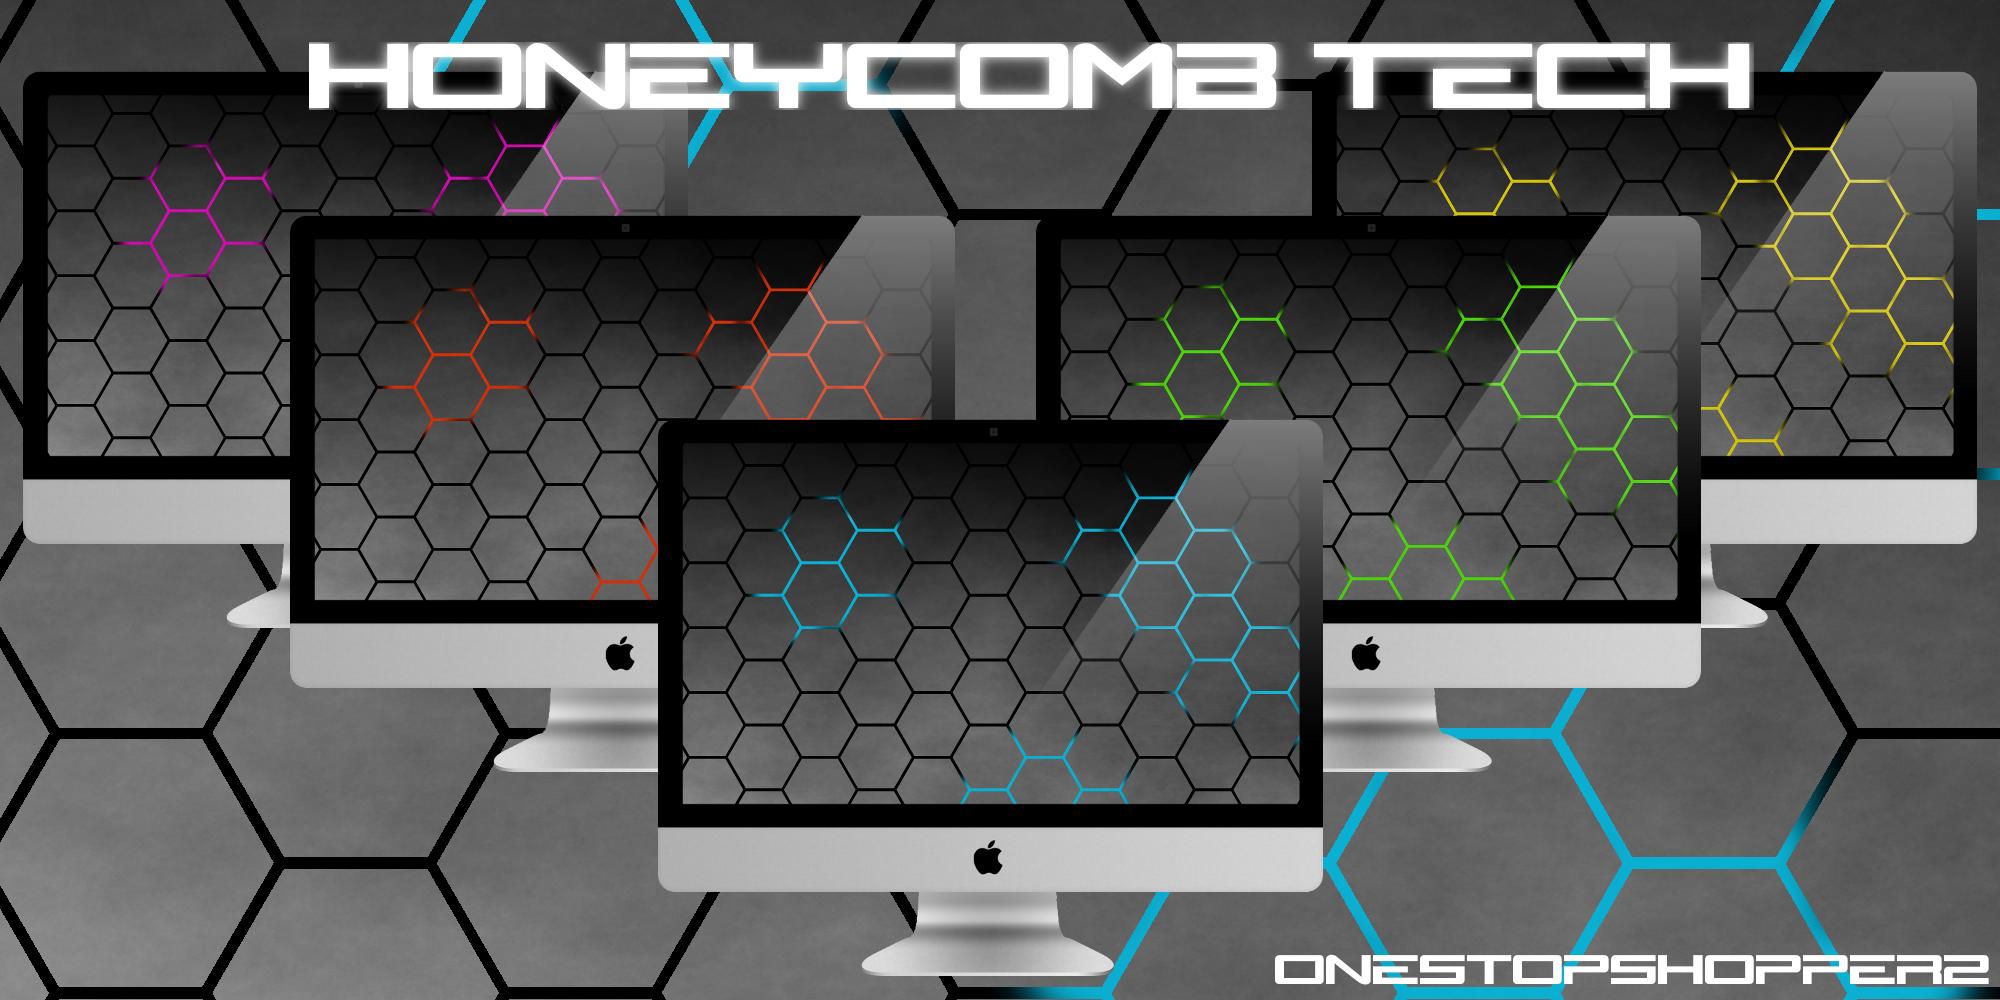 Honeycomb Technology by SierraDesign